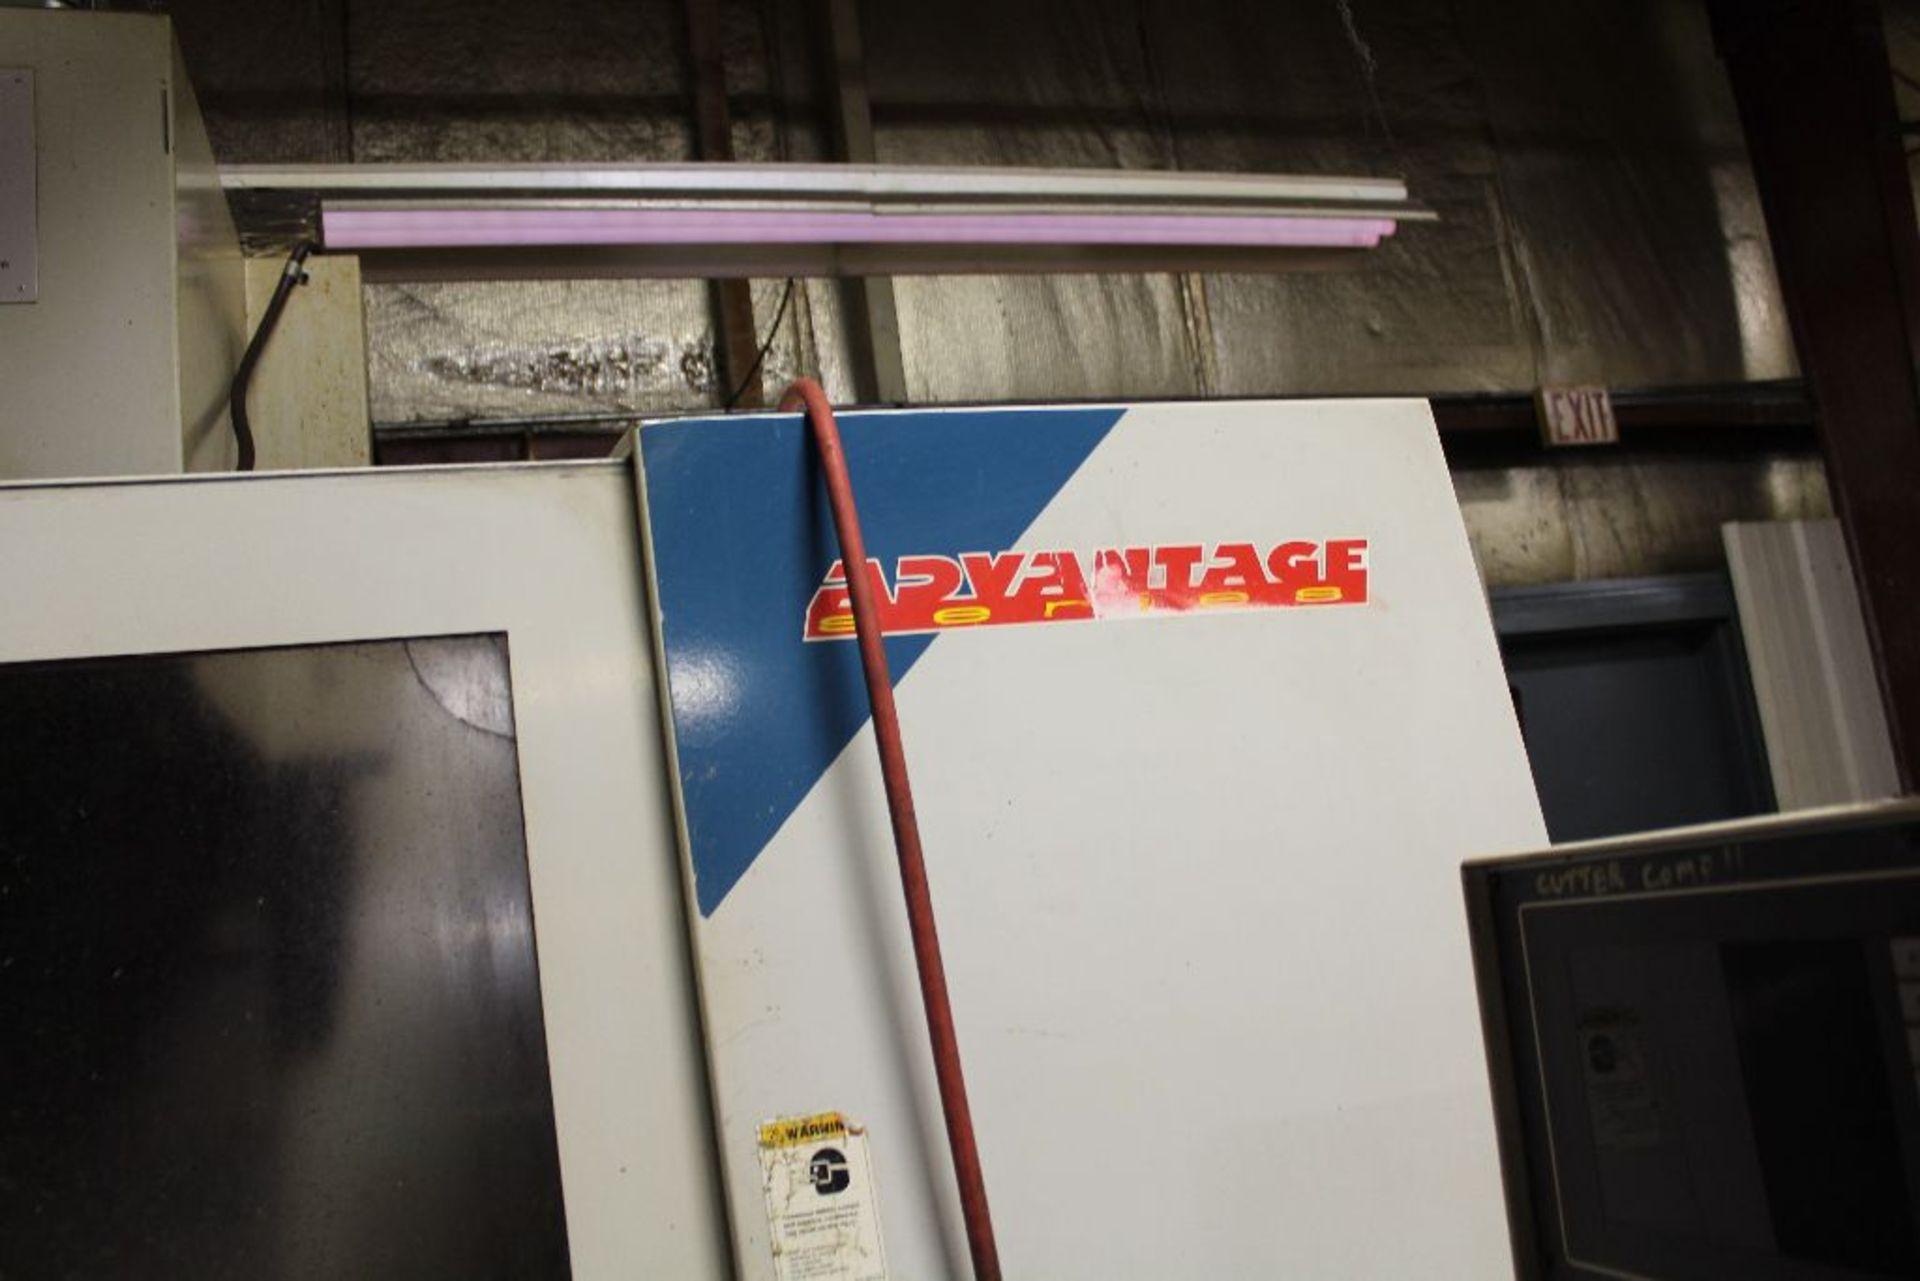 Lot 024 - 1998 Hurco Vertical Machining Center, Advantage Series, model BMC4020SSM, Q6249.